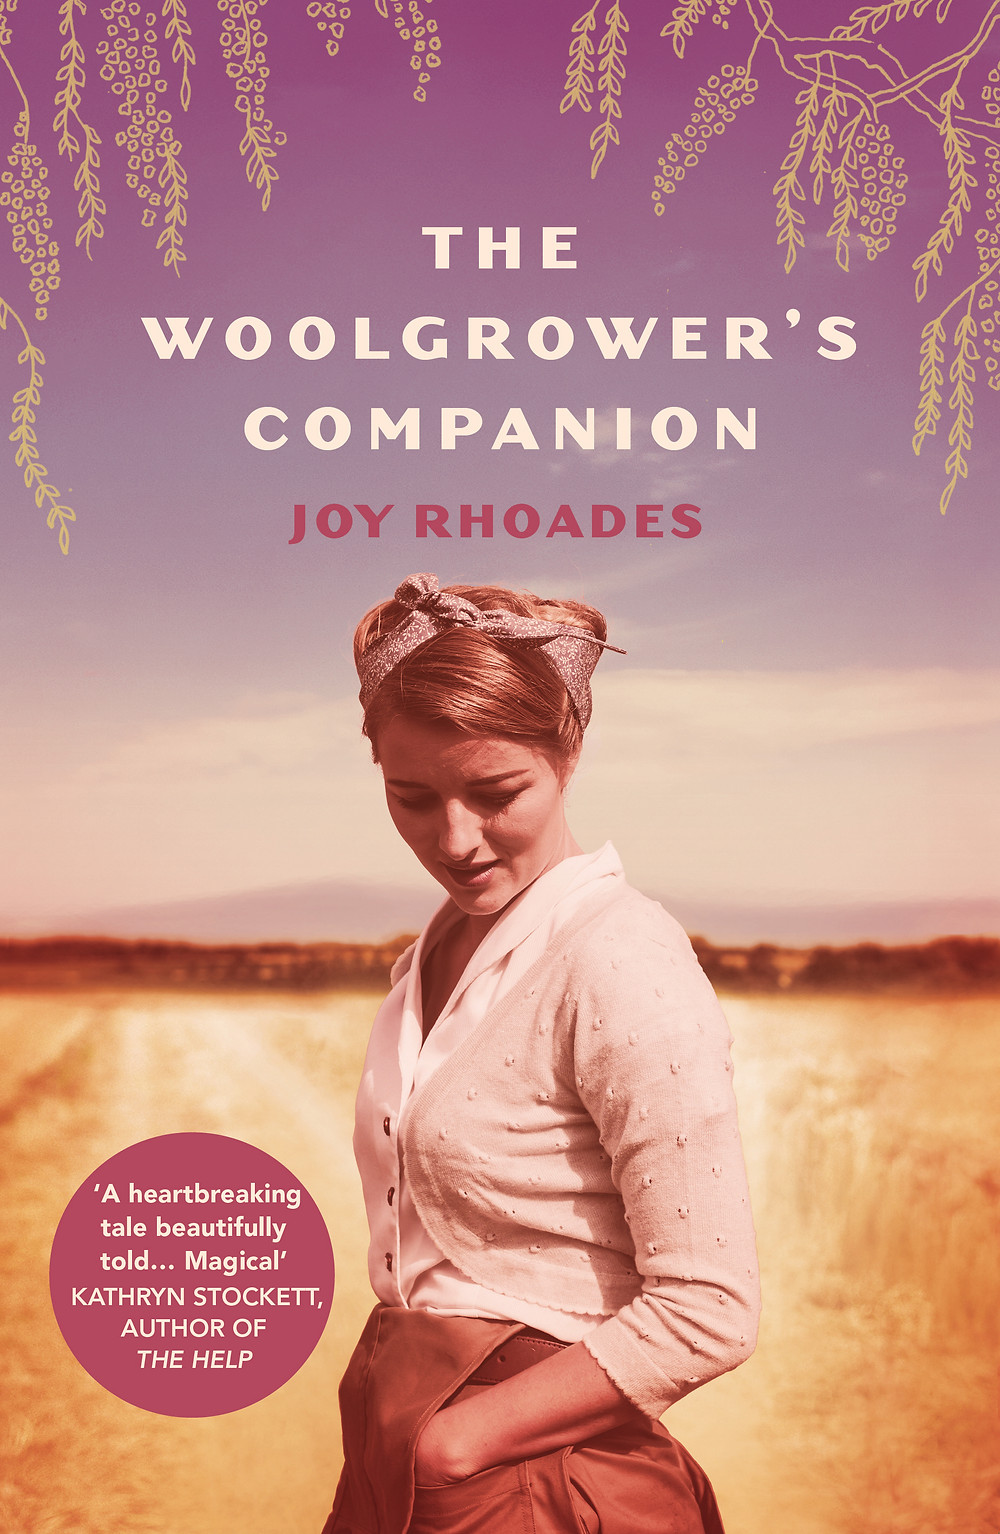 The Woolgrower's Companion | The Riff Raff